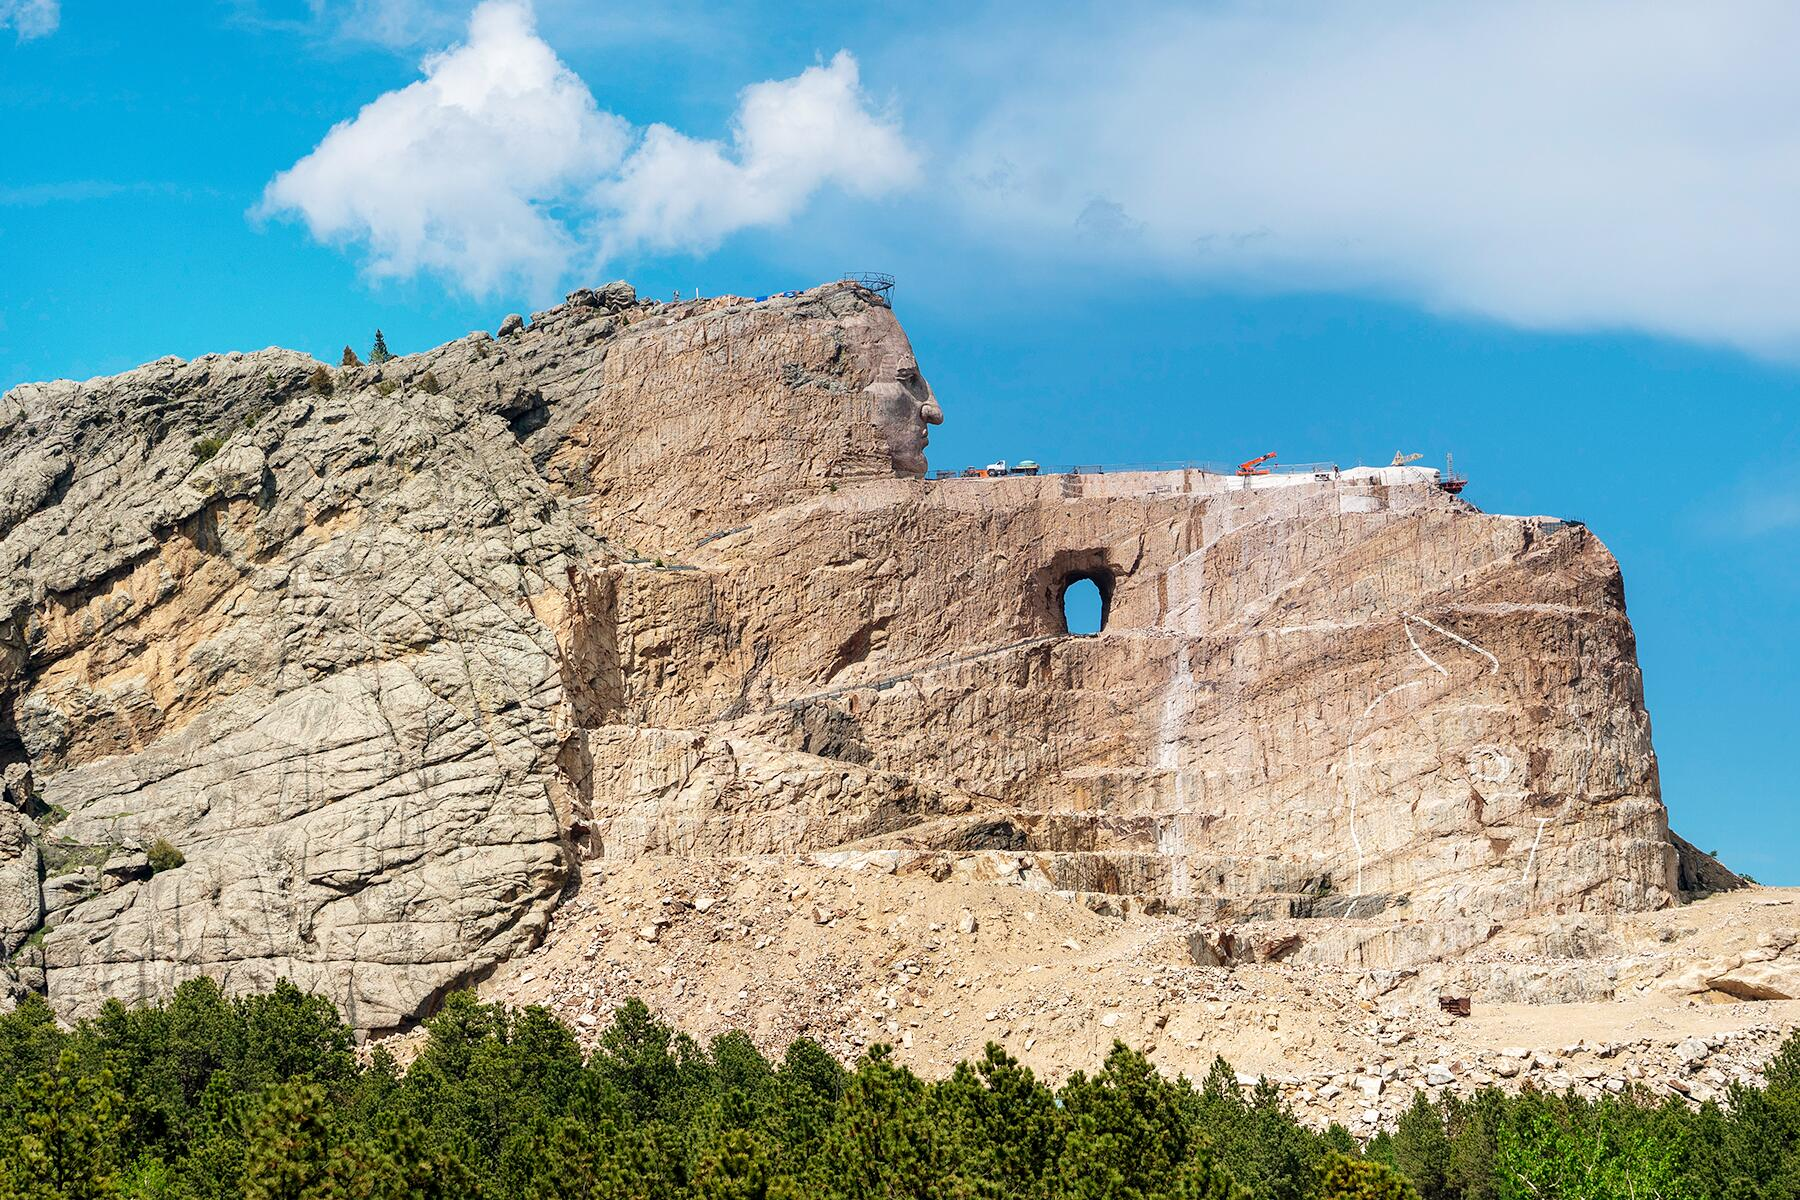 Mount Rushmore to Deadwood, South Dakota